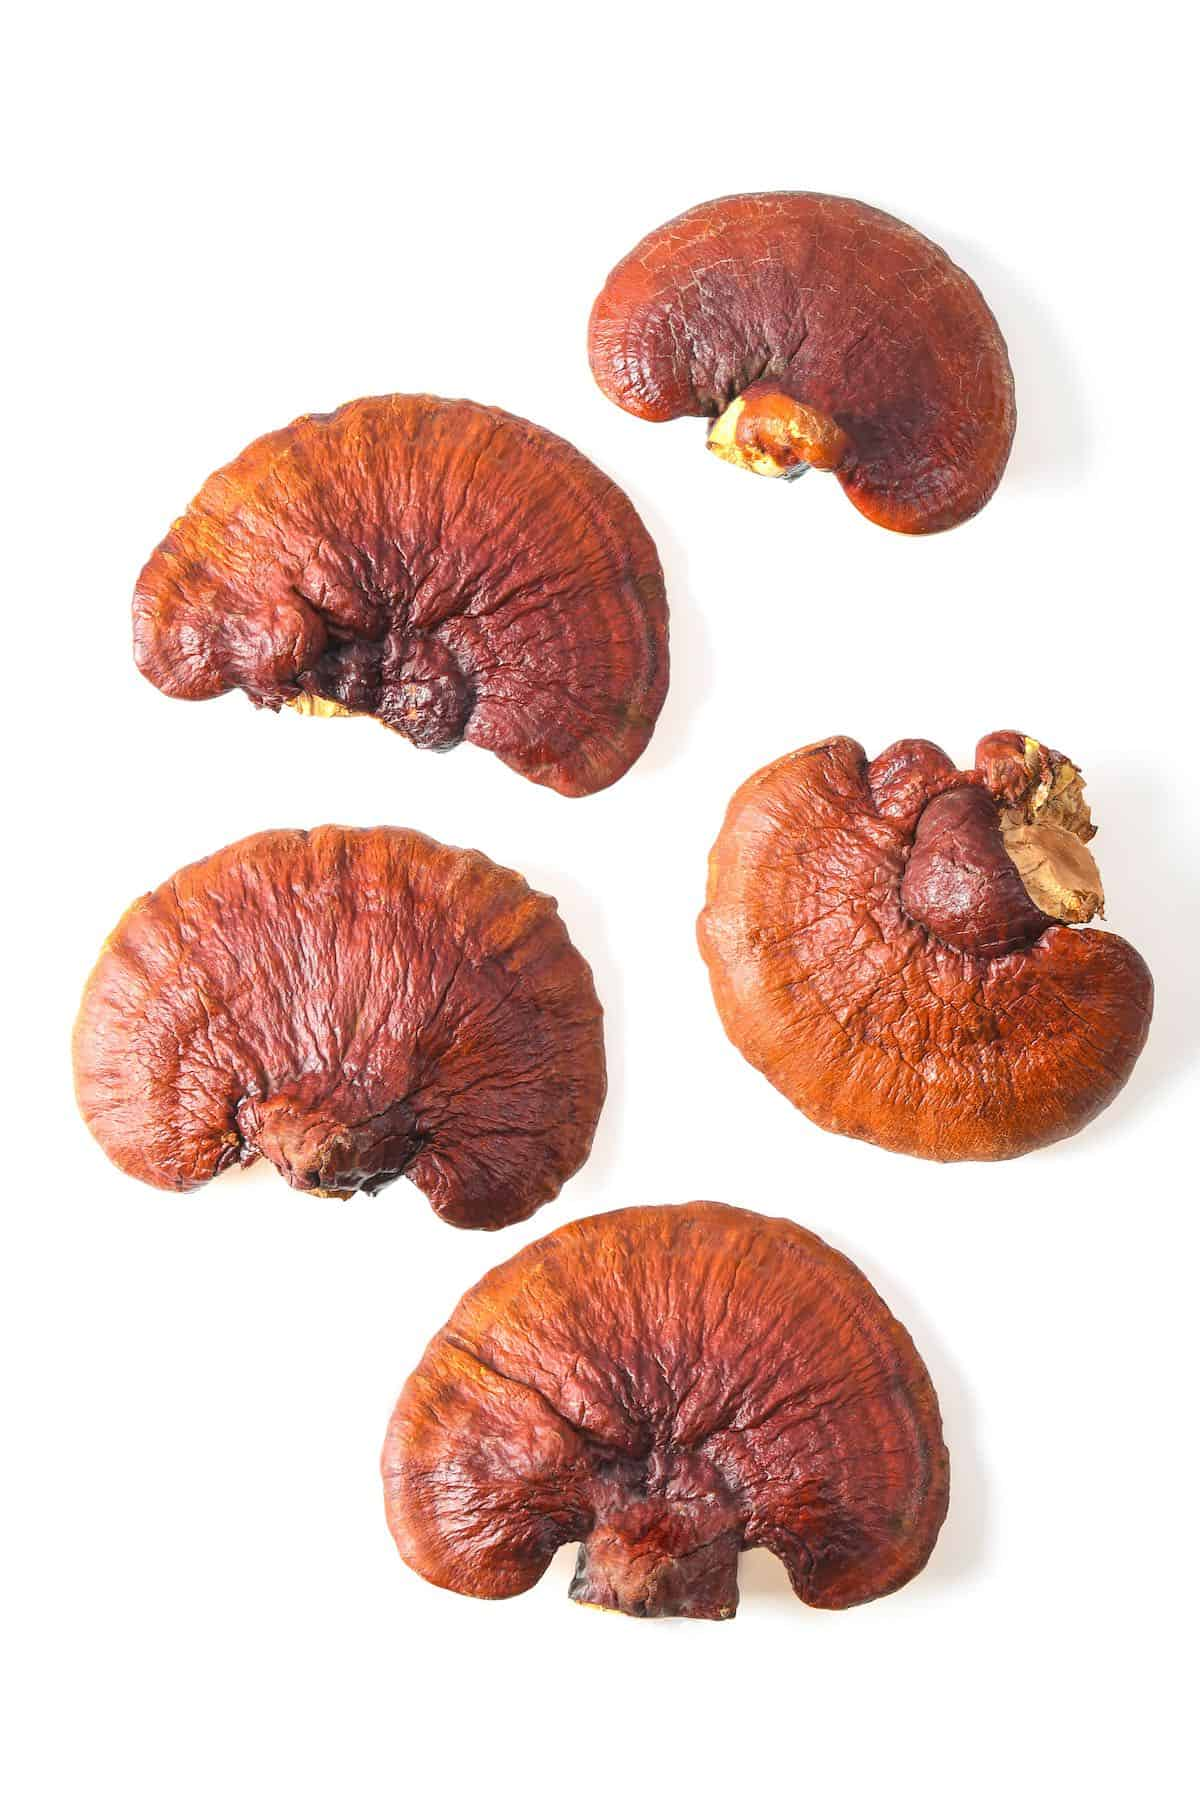 Reishi mushroom on a white background